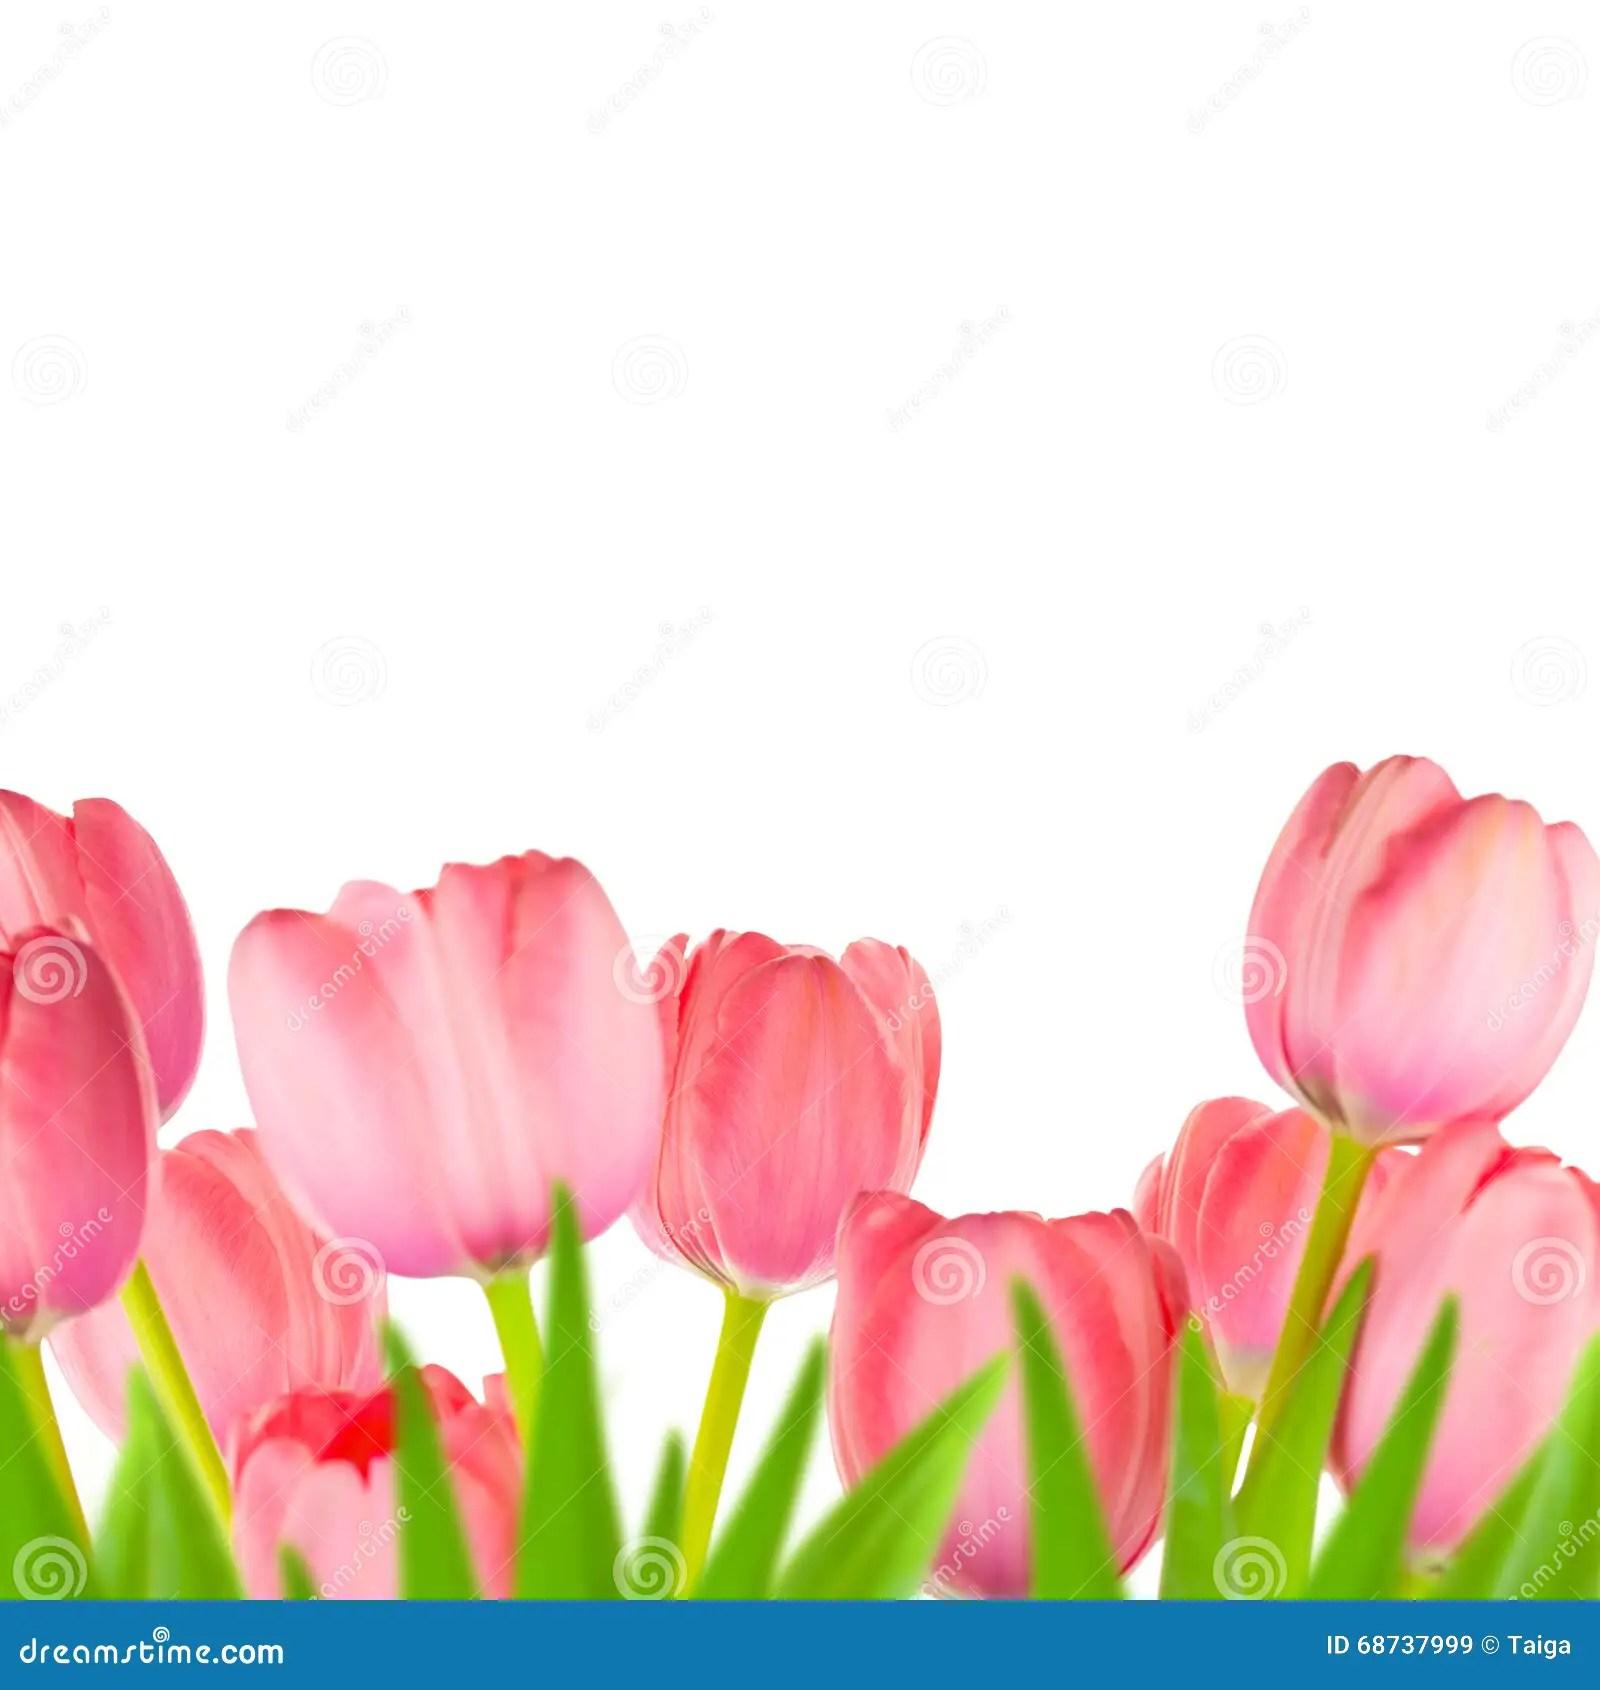 Cute Watercolor Wallpaper Spring Gentle Light Pink Tulips Border Stock Image